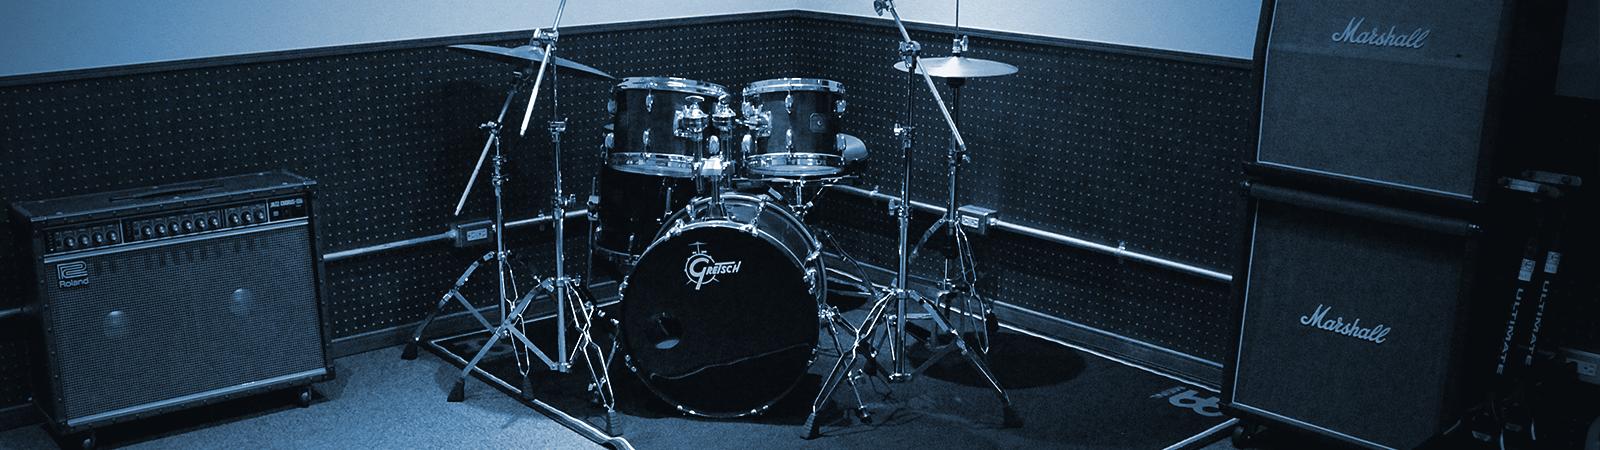 MRT Music Studio 周船寺店 Bスタジオ